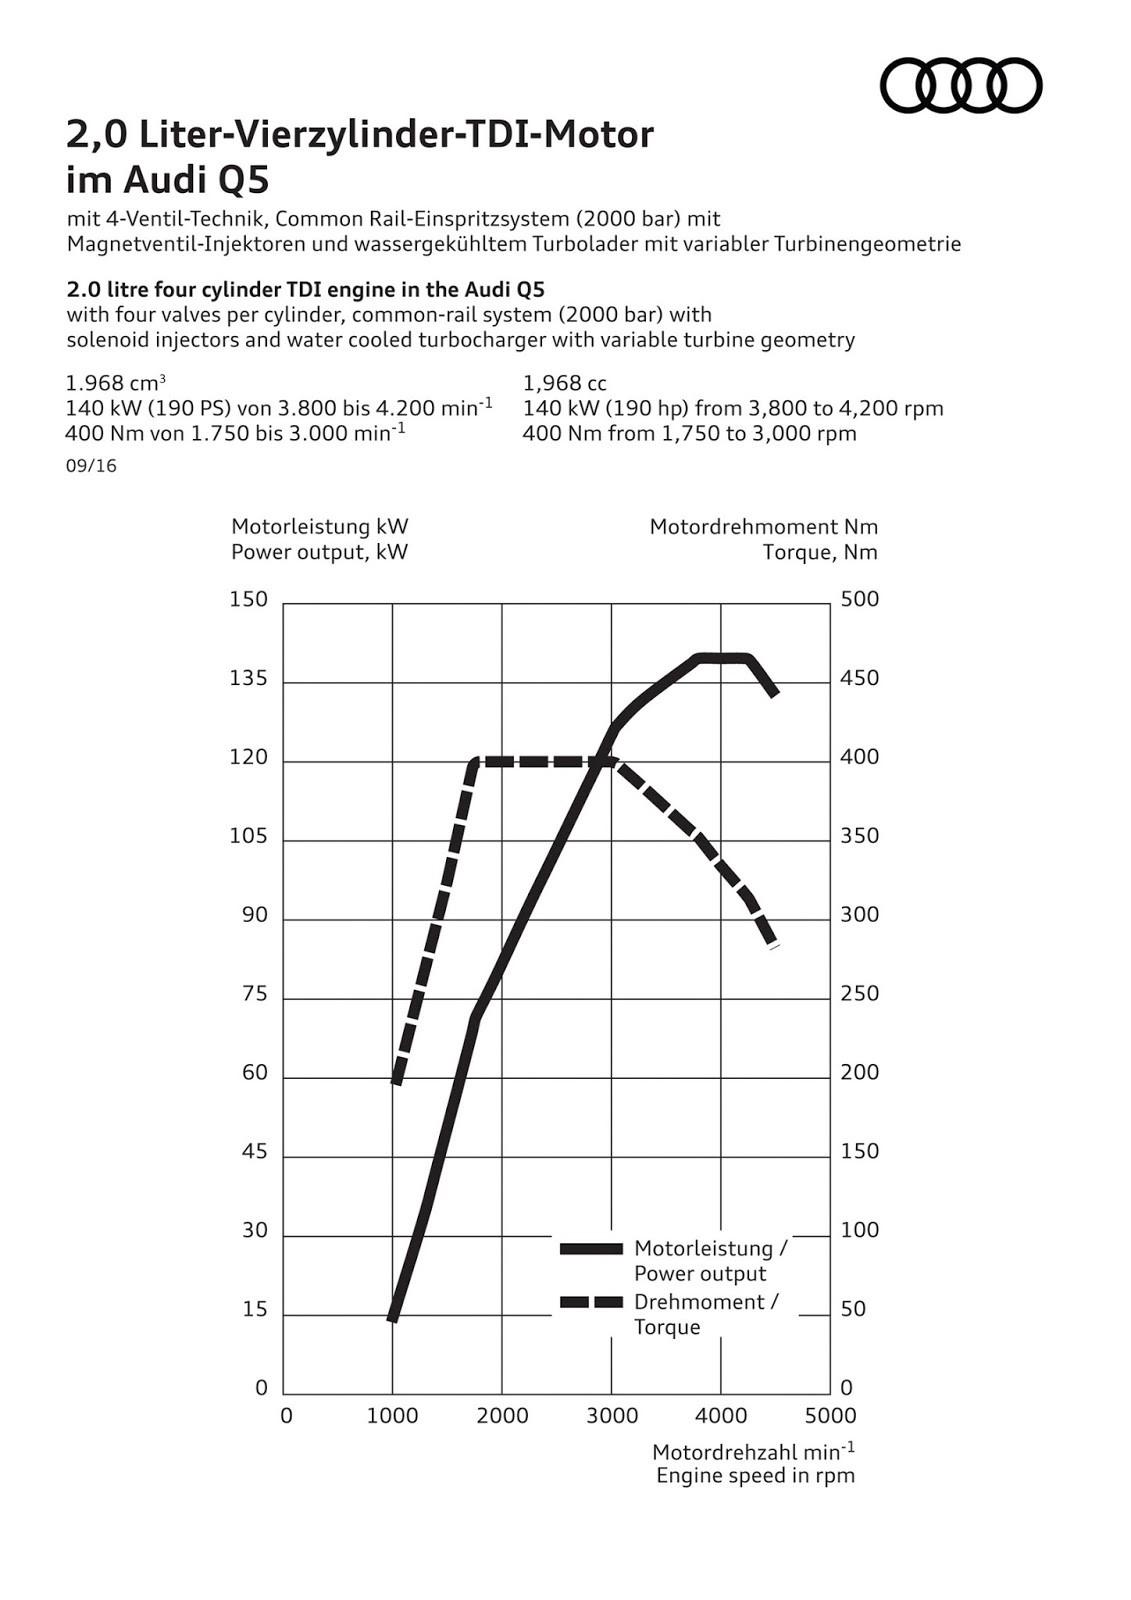 Audi RS Q5 SUV Will Borrow 2.9L Twin-Turbo V6 Engine from ... Vw Turbo Engine Diagram on all vw 1998 engine diagram, 06 vw passat 2.0t engine diagram, vw 2.5 turbo, vw 2.0t fsi engine diagram, hyundai 2.0 engine diagram, vw 2.5 liter engine, vw 2.0 turbo engine review, rx7 twin turbo engine diagram, vw gti engine diagram, vw 1.8 engine diagram, vw air cooled engine diagram, vw v6 engine diagram, 2003 vw passat turbo diagram, vw audi engine diagram, 03 jetta 2.0 engine diagram, vw jetta engine diagram, vw type 3 engine diagram, vw 1600 engine diagram, vw engine breakdown, 2000 jetta 2.0 engine diagram,